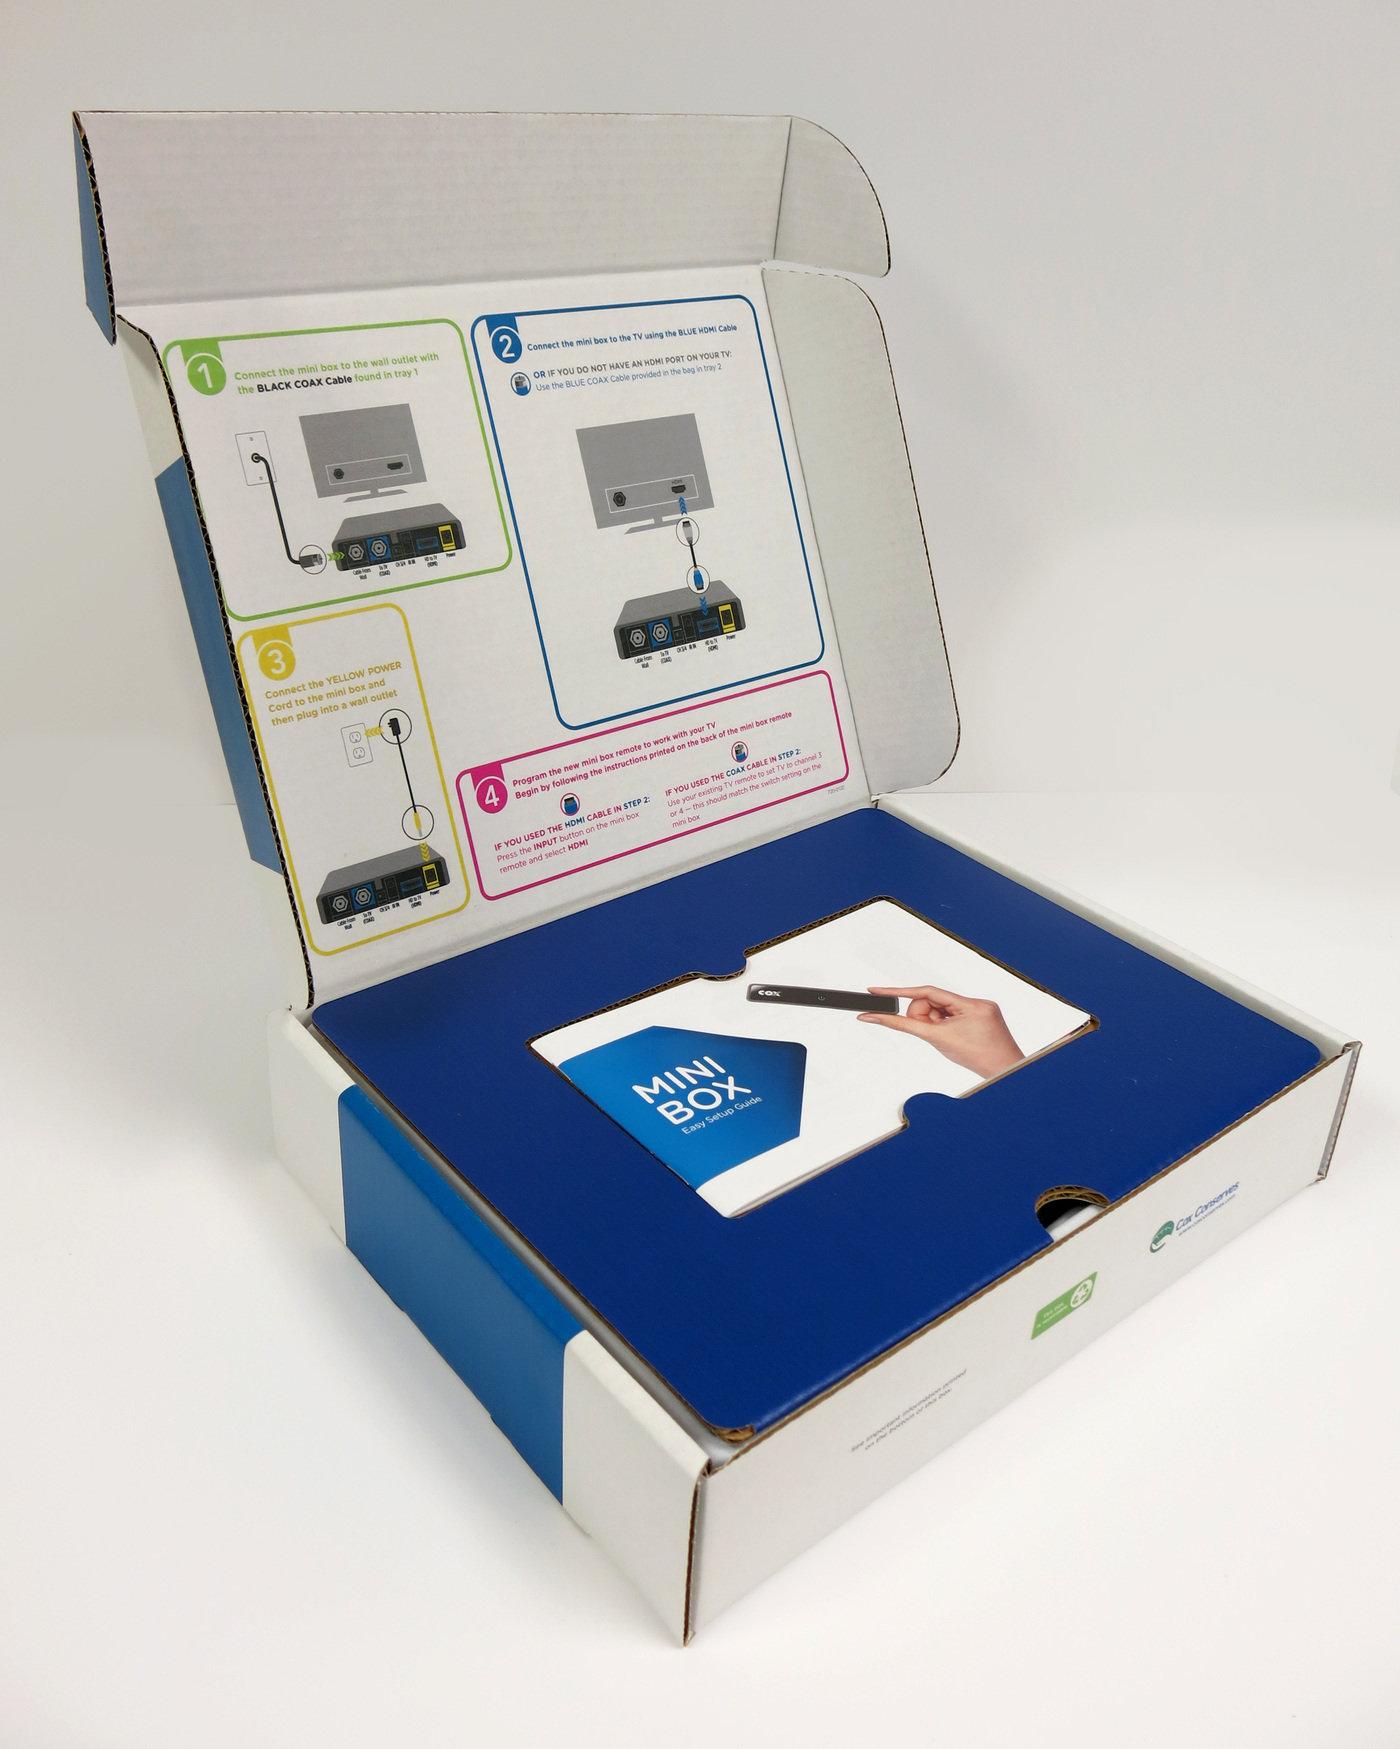 Cox Communications Mini Box By Robbie Workman At Coroflotcom